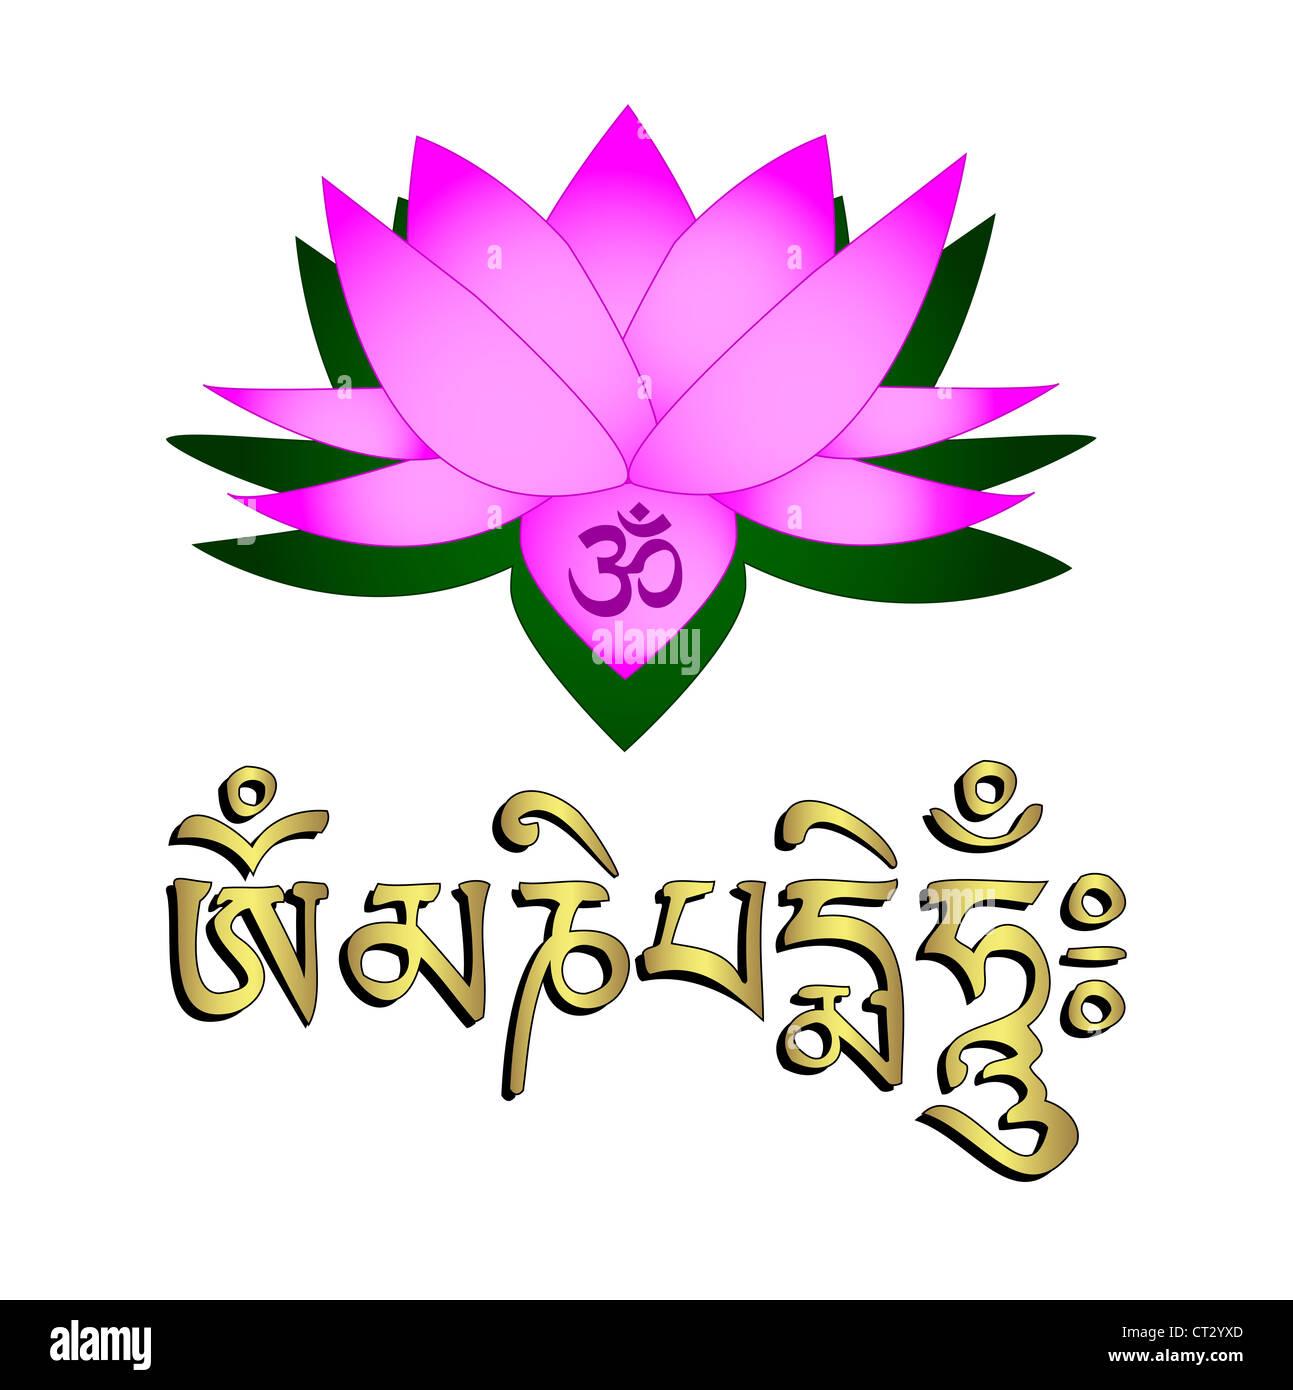 Lotus flower om symbol and mantra om mani padme hum stock photo lotus flower om symbol and mantra om mani padme hum izmirmasajfo